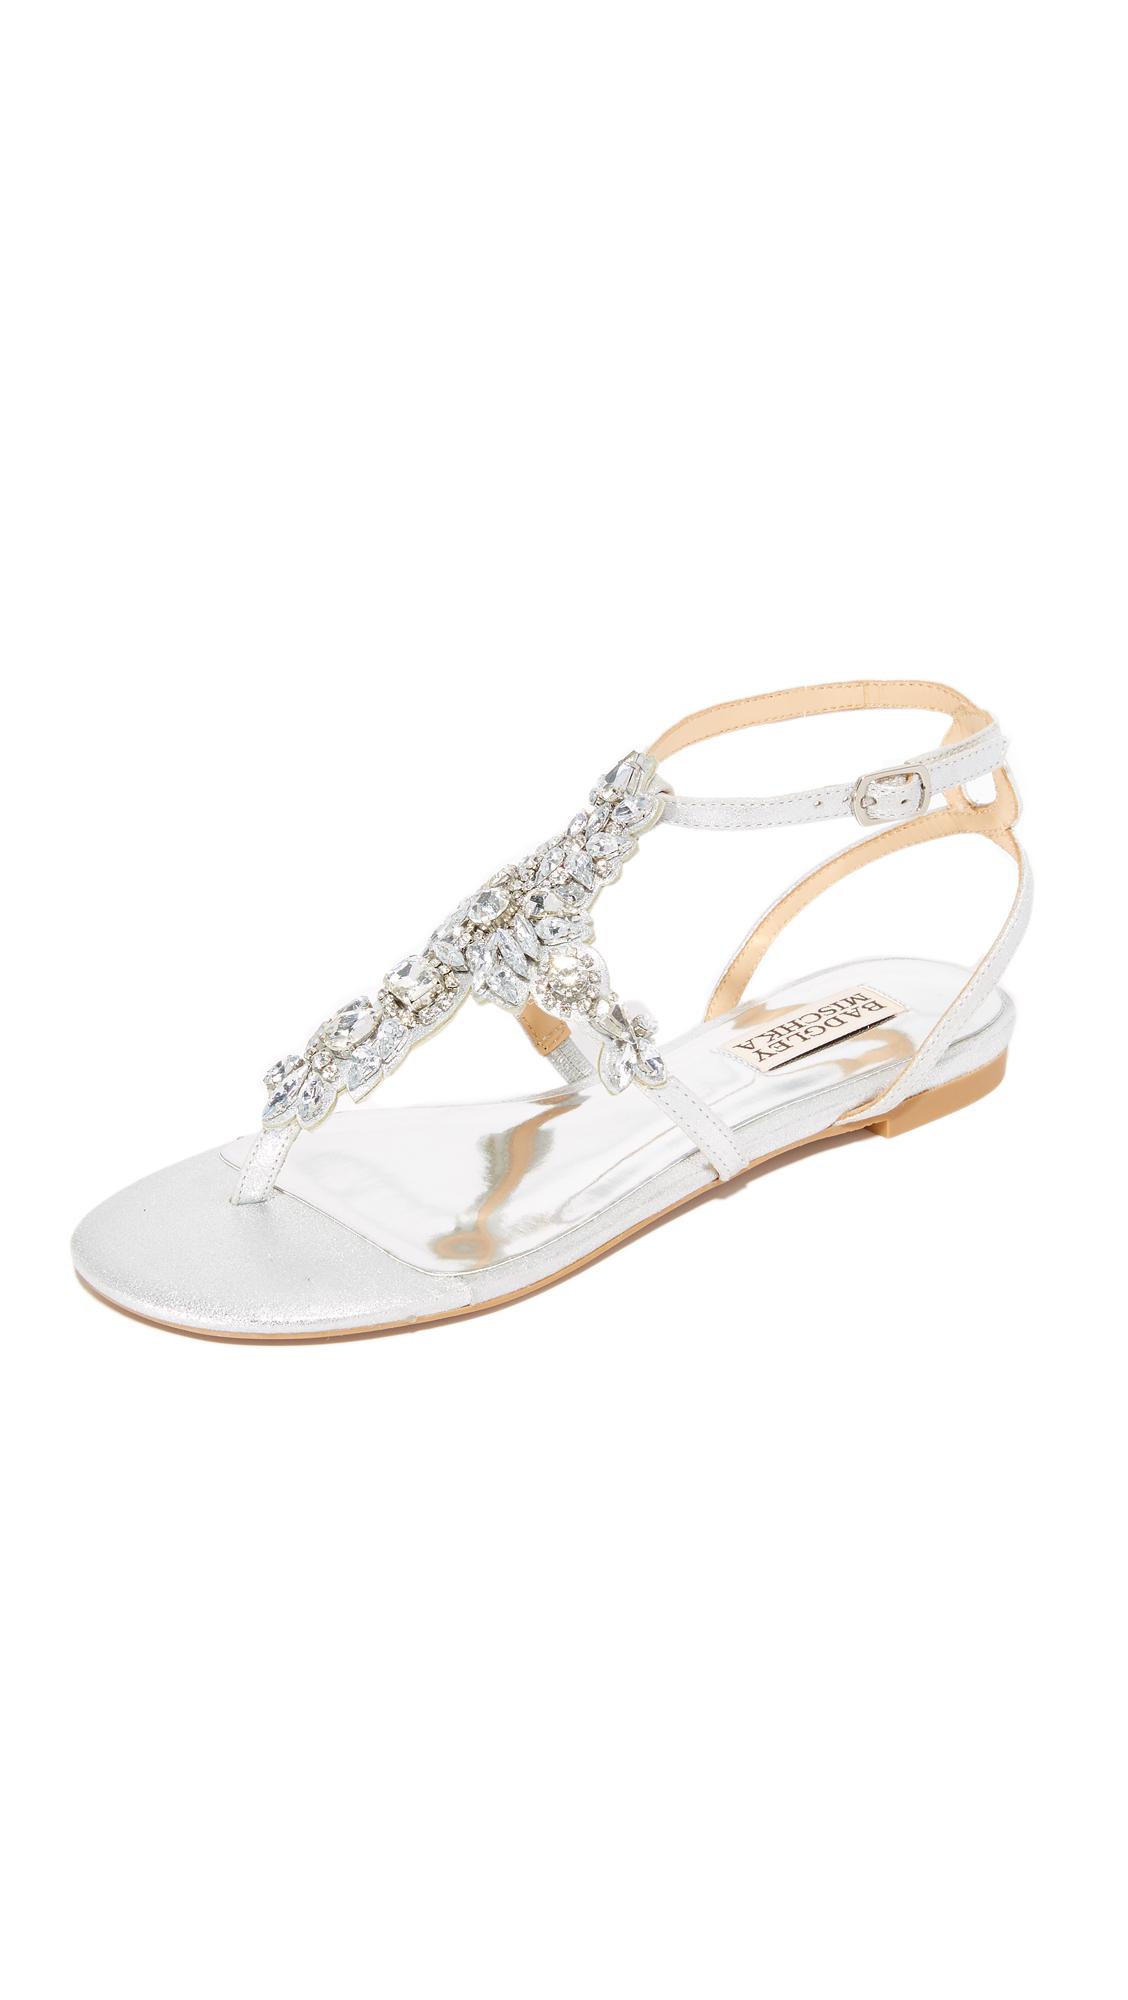 Photo of Badgley Mischka Cara Ii Sandals Silver - Badgley Mischka online